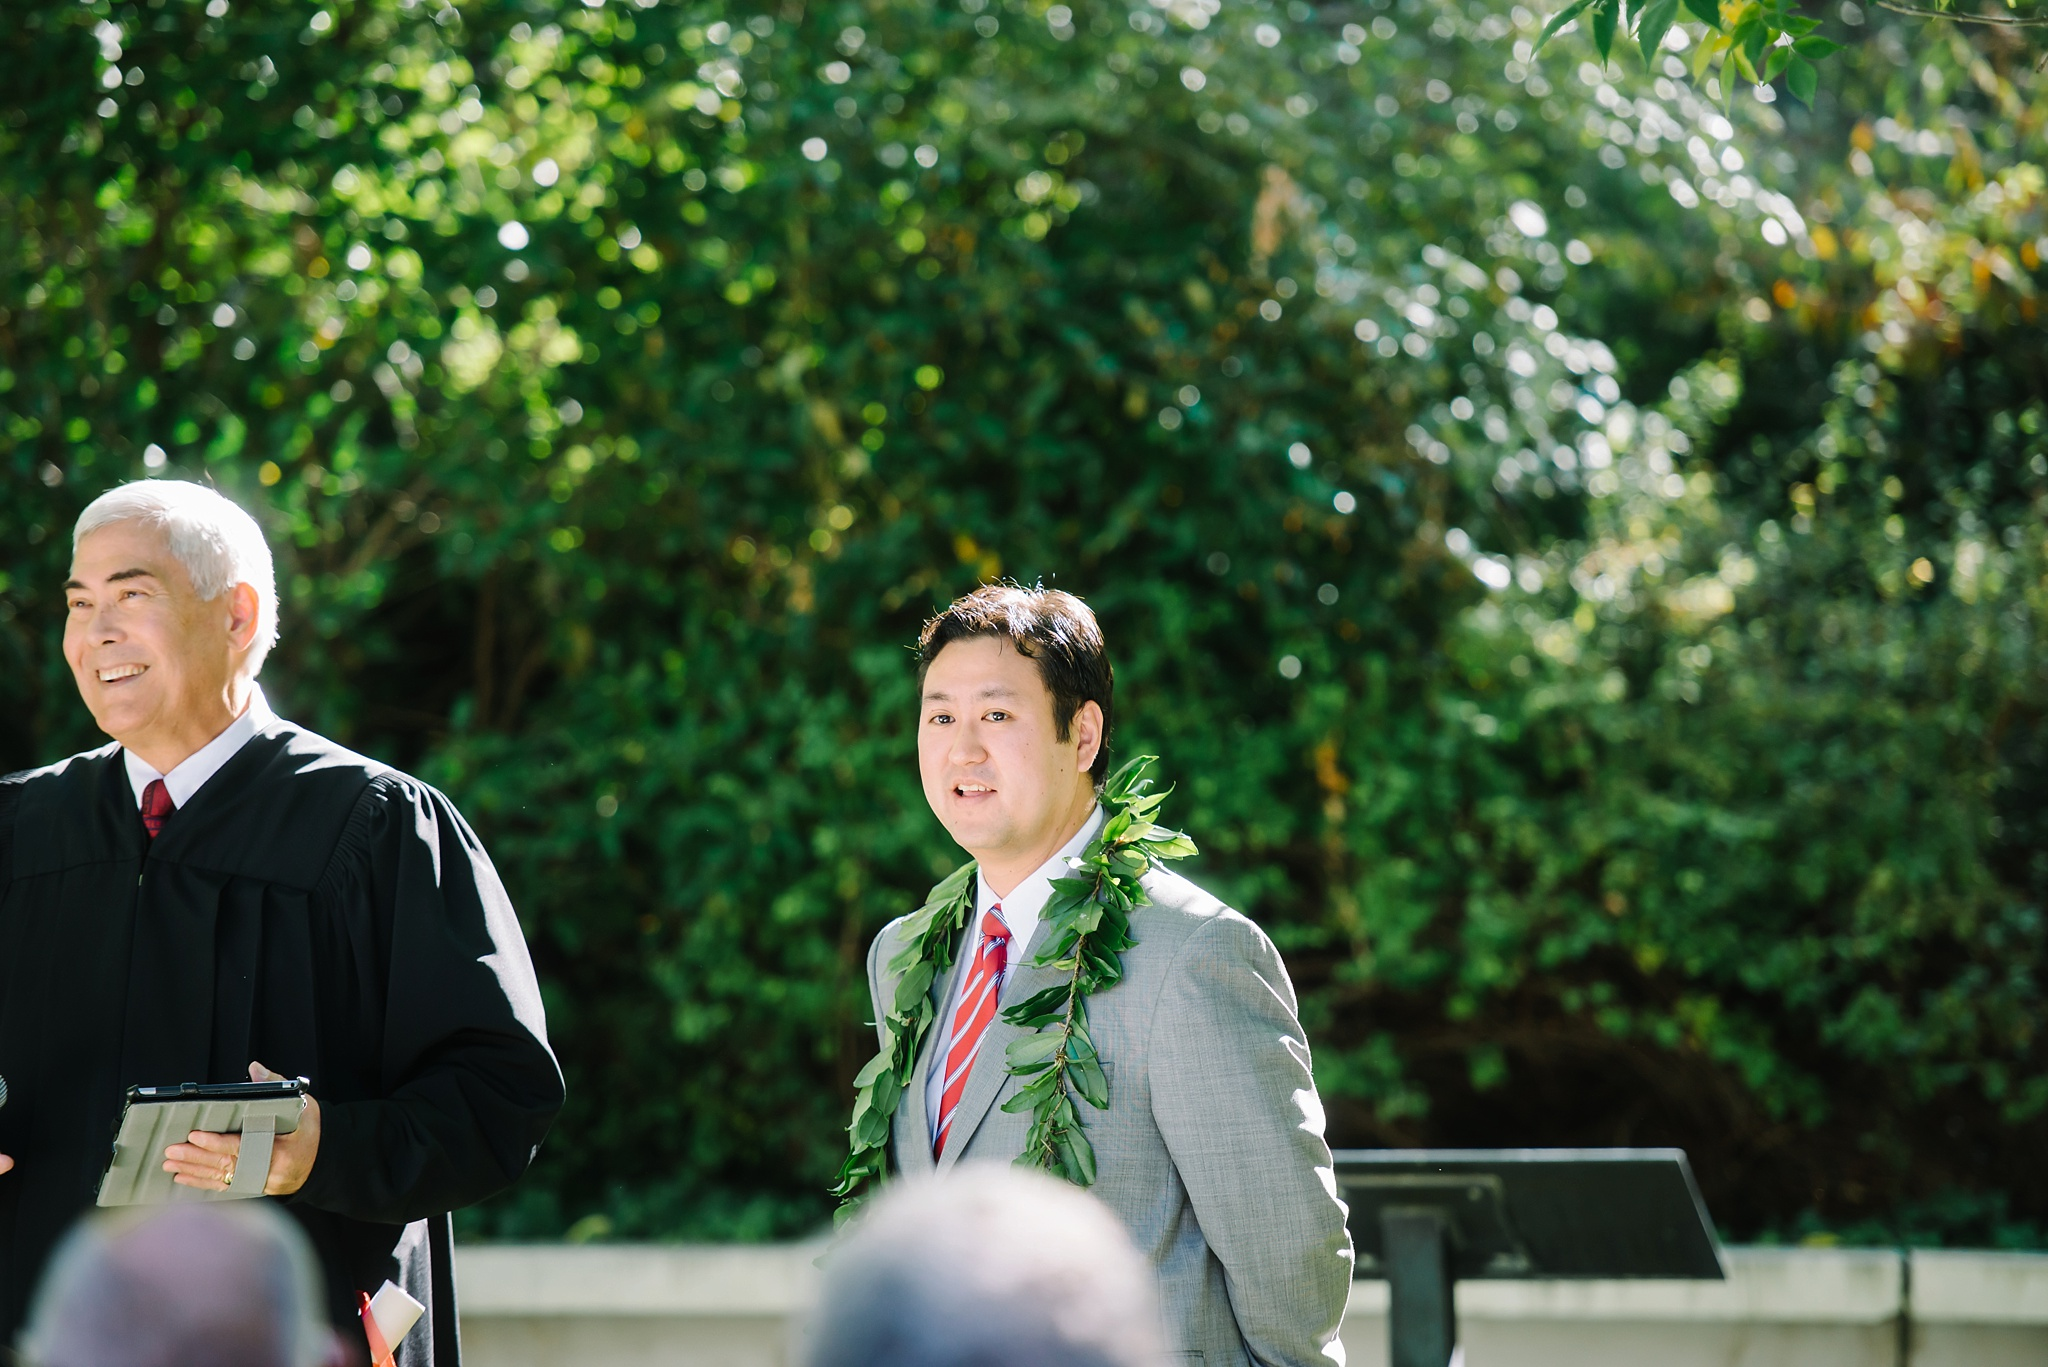 Park City Wedding Photographer Ali Sumsion 026